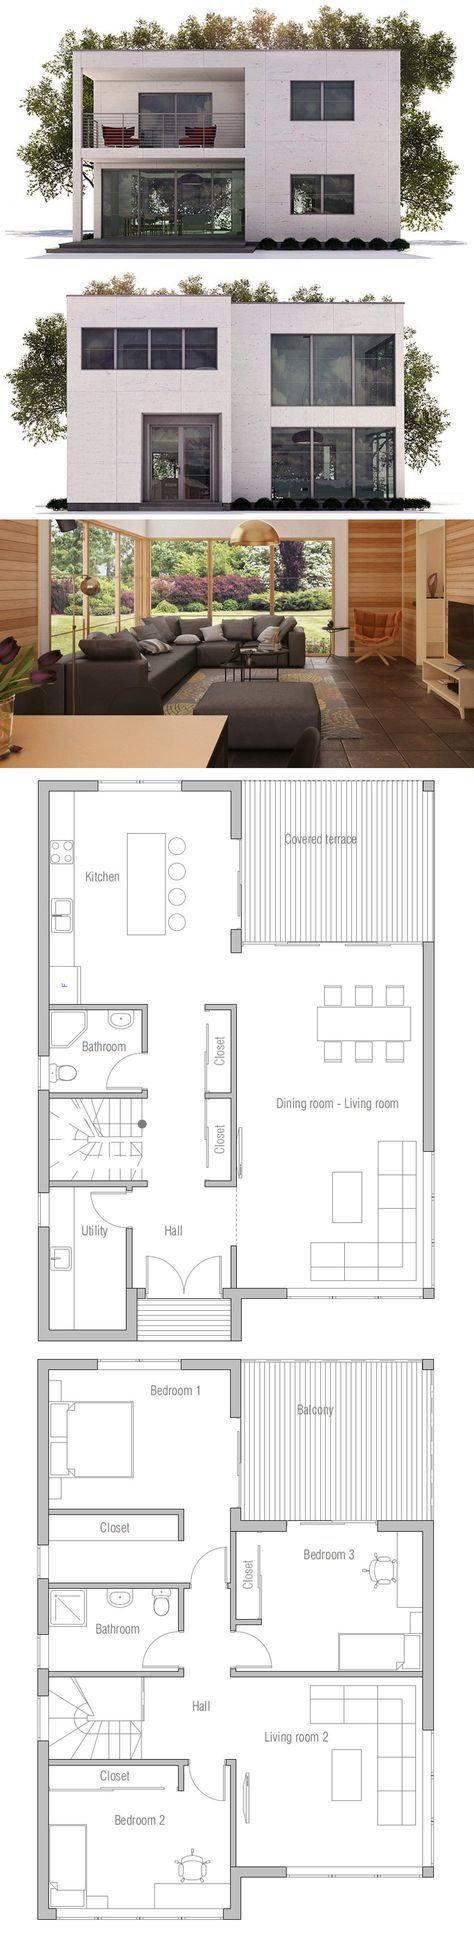 House Plan CH399